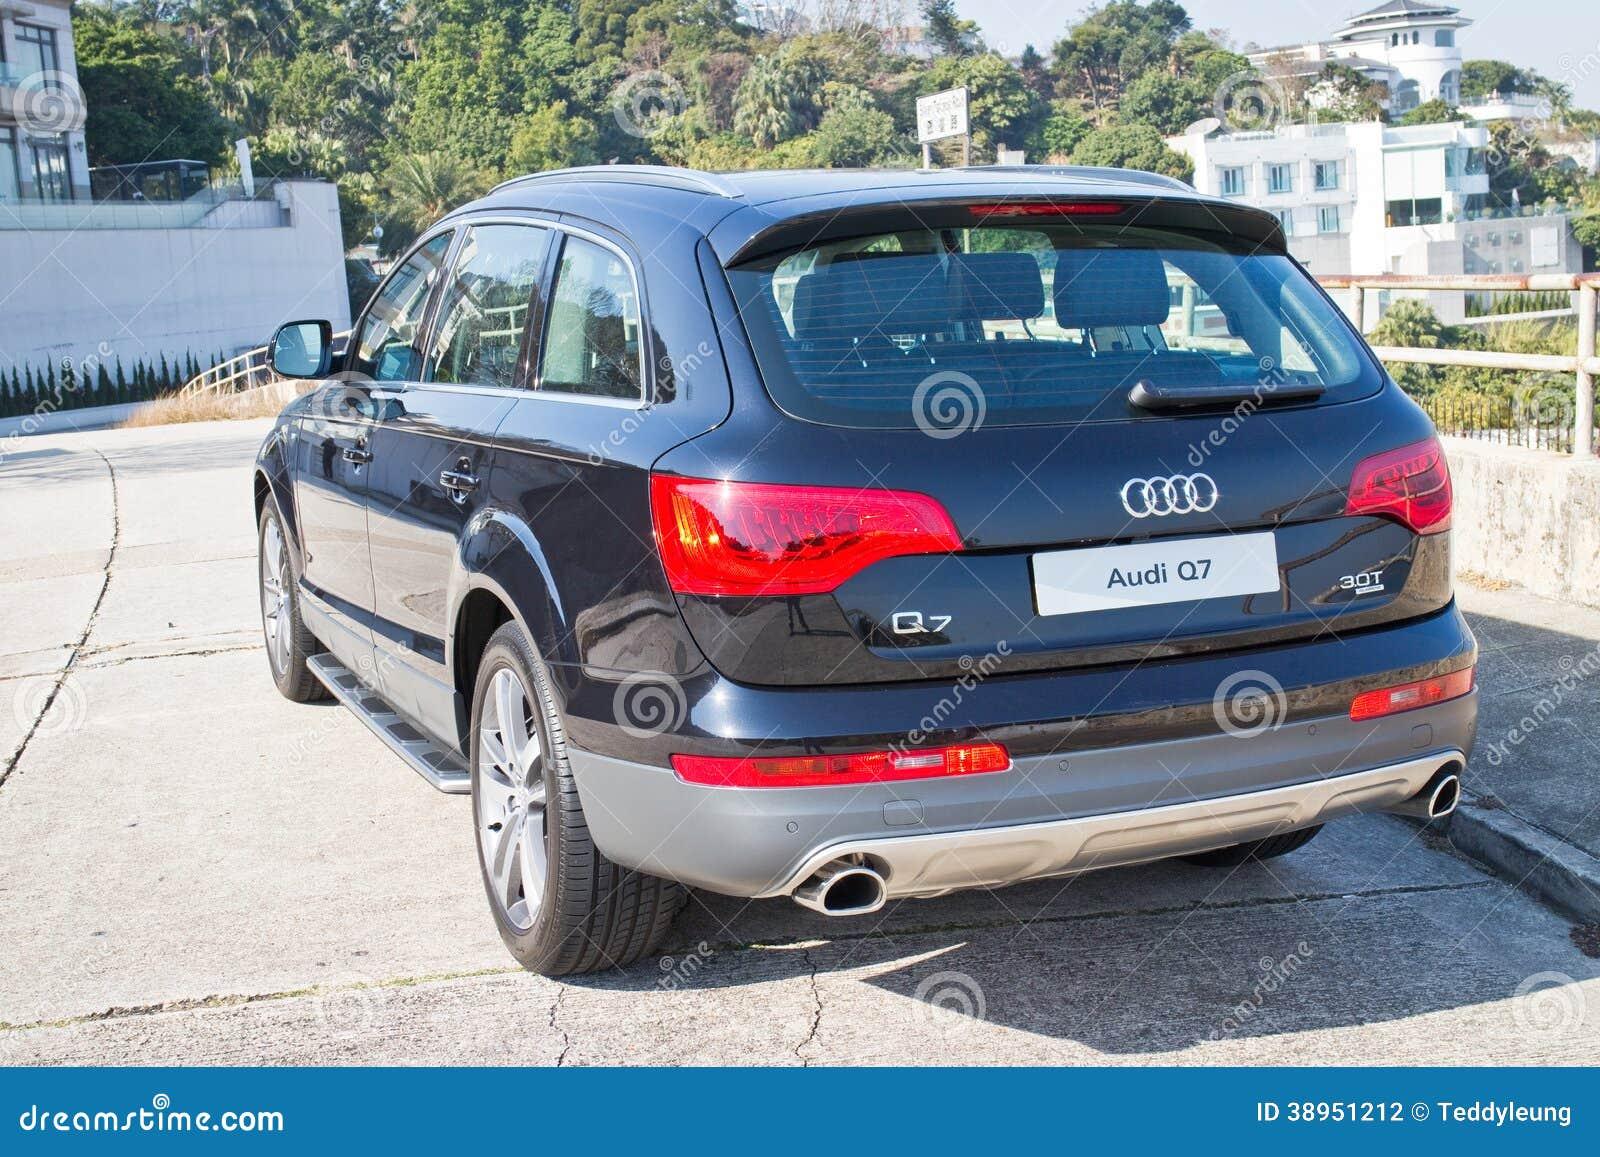 Audi Q7 3 0t Quattro 2014 Back Side Bumper Editorial Photography Image Of Transportation Motor 38951212